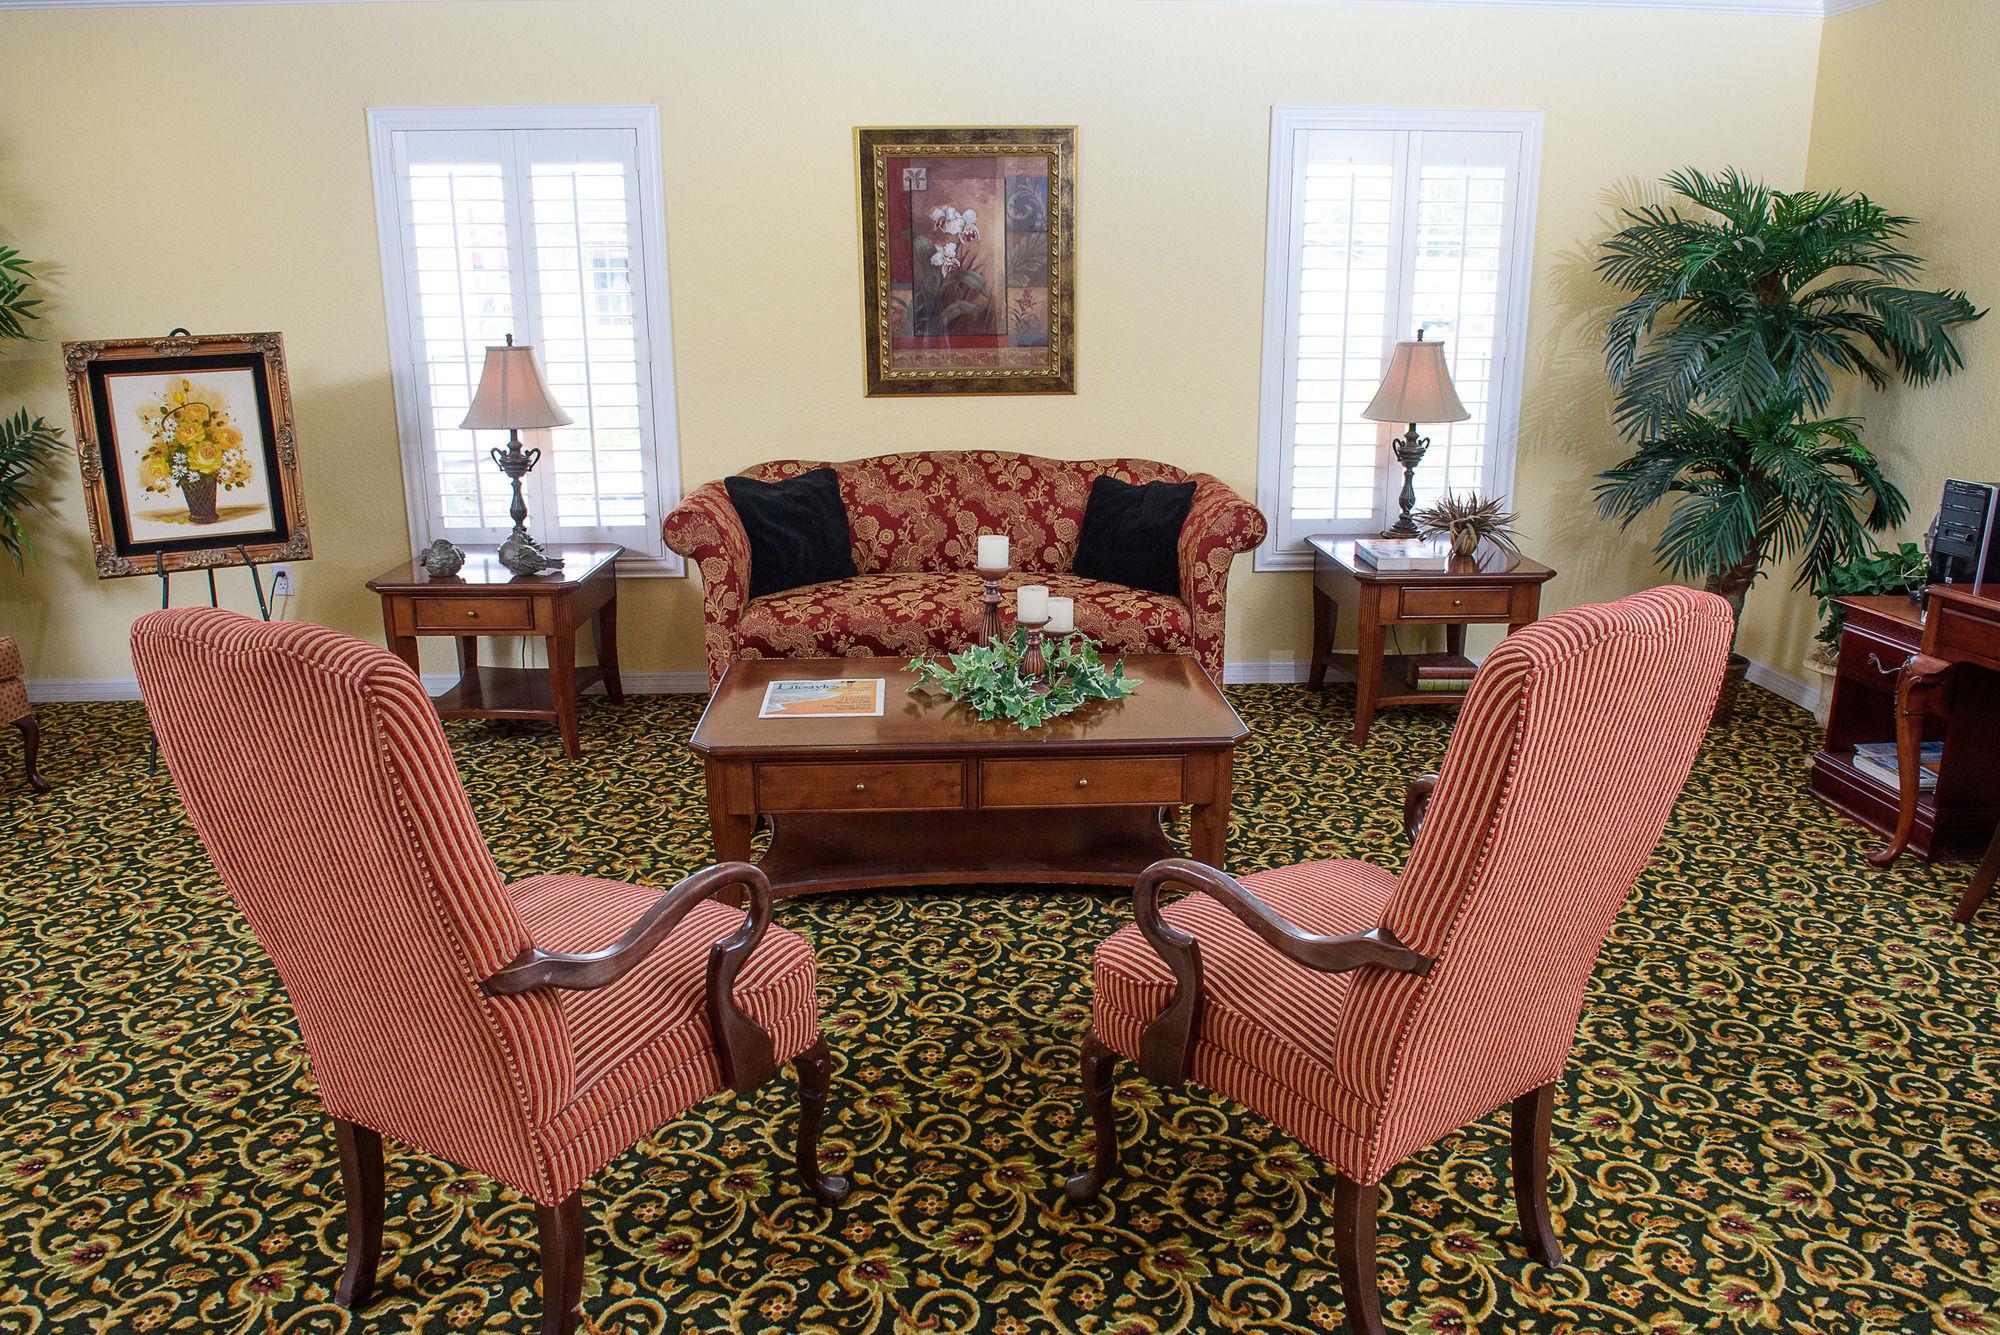 Magnuson Hotel Zephyrhills in Zephyrhills, FL